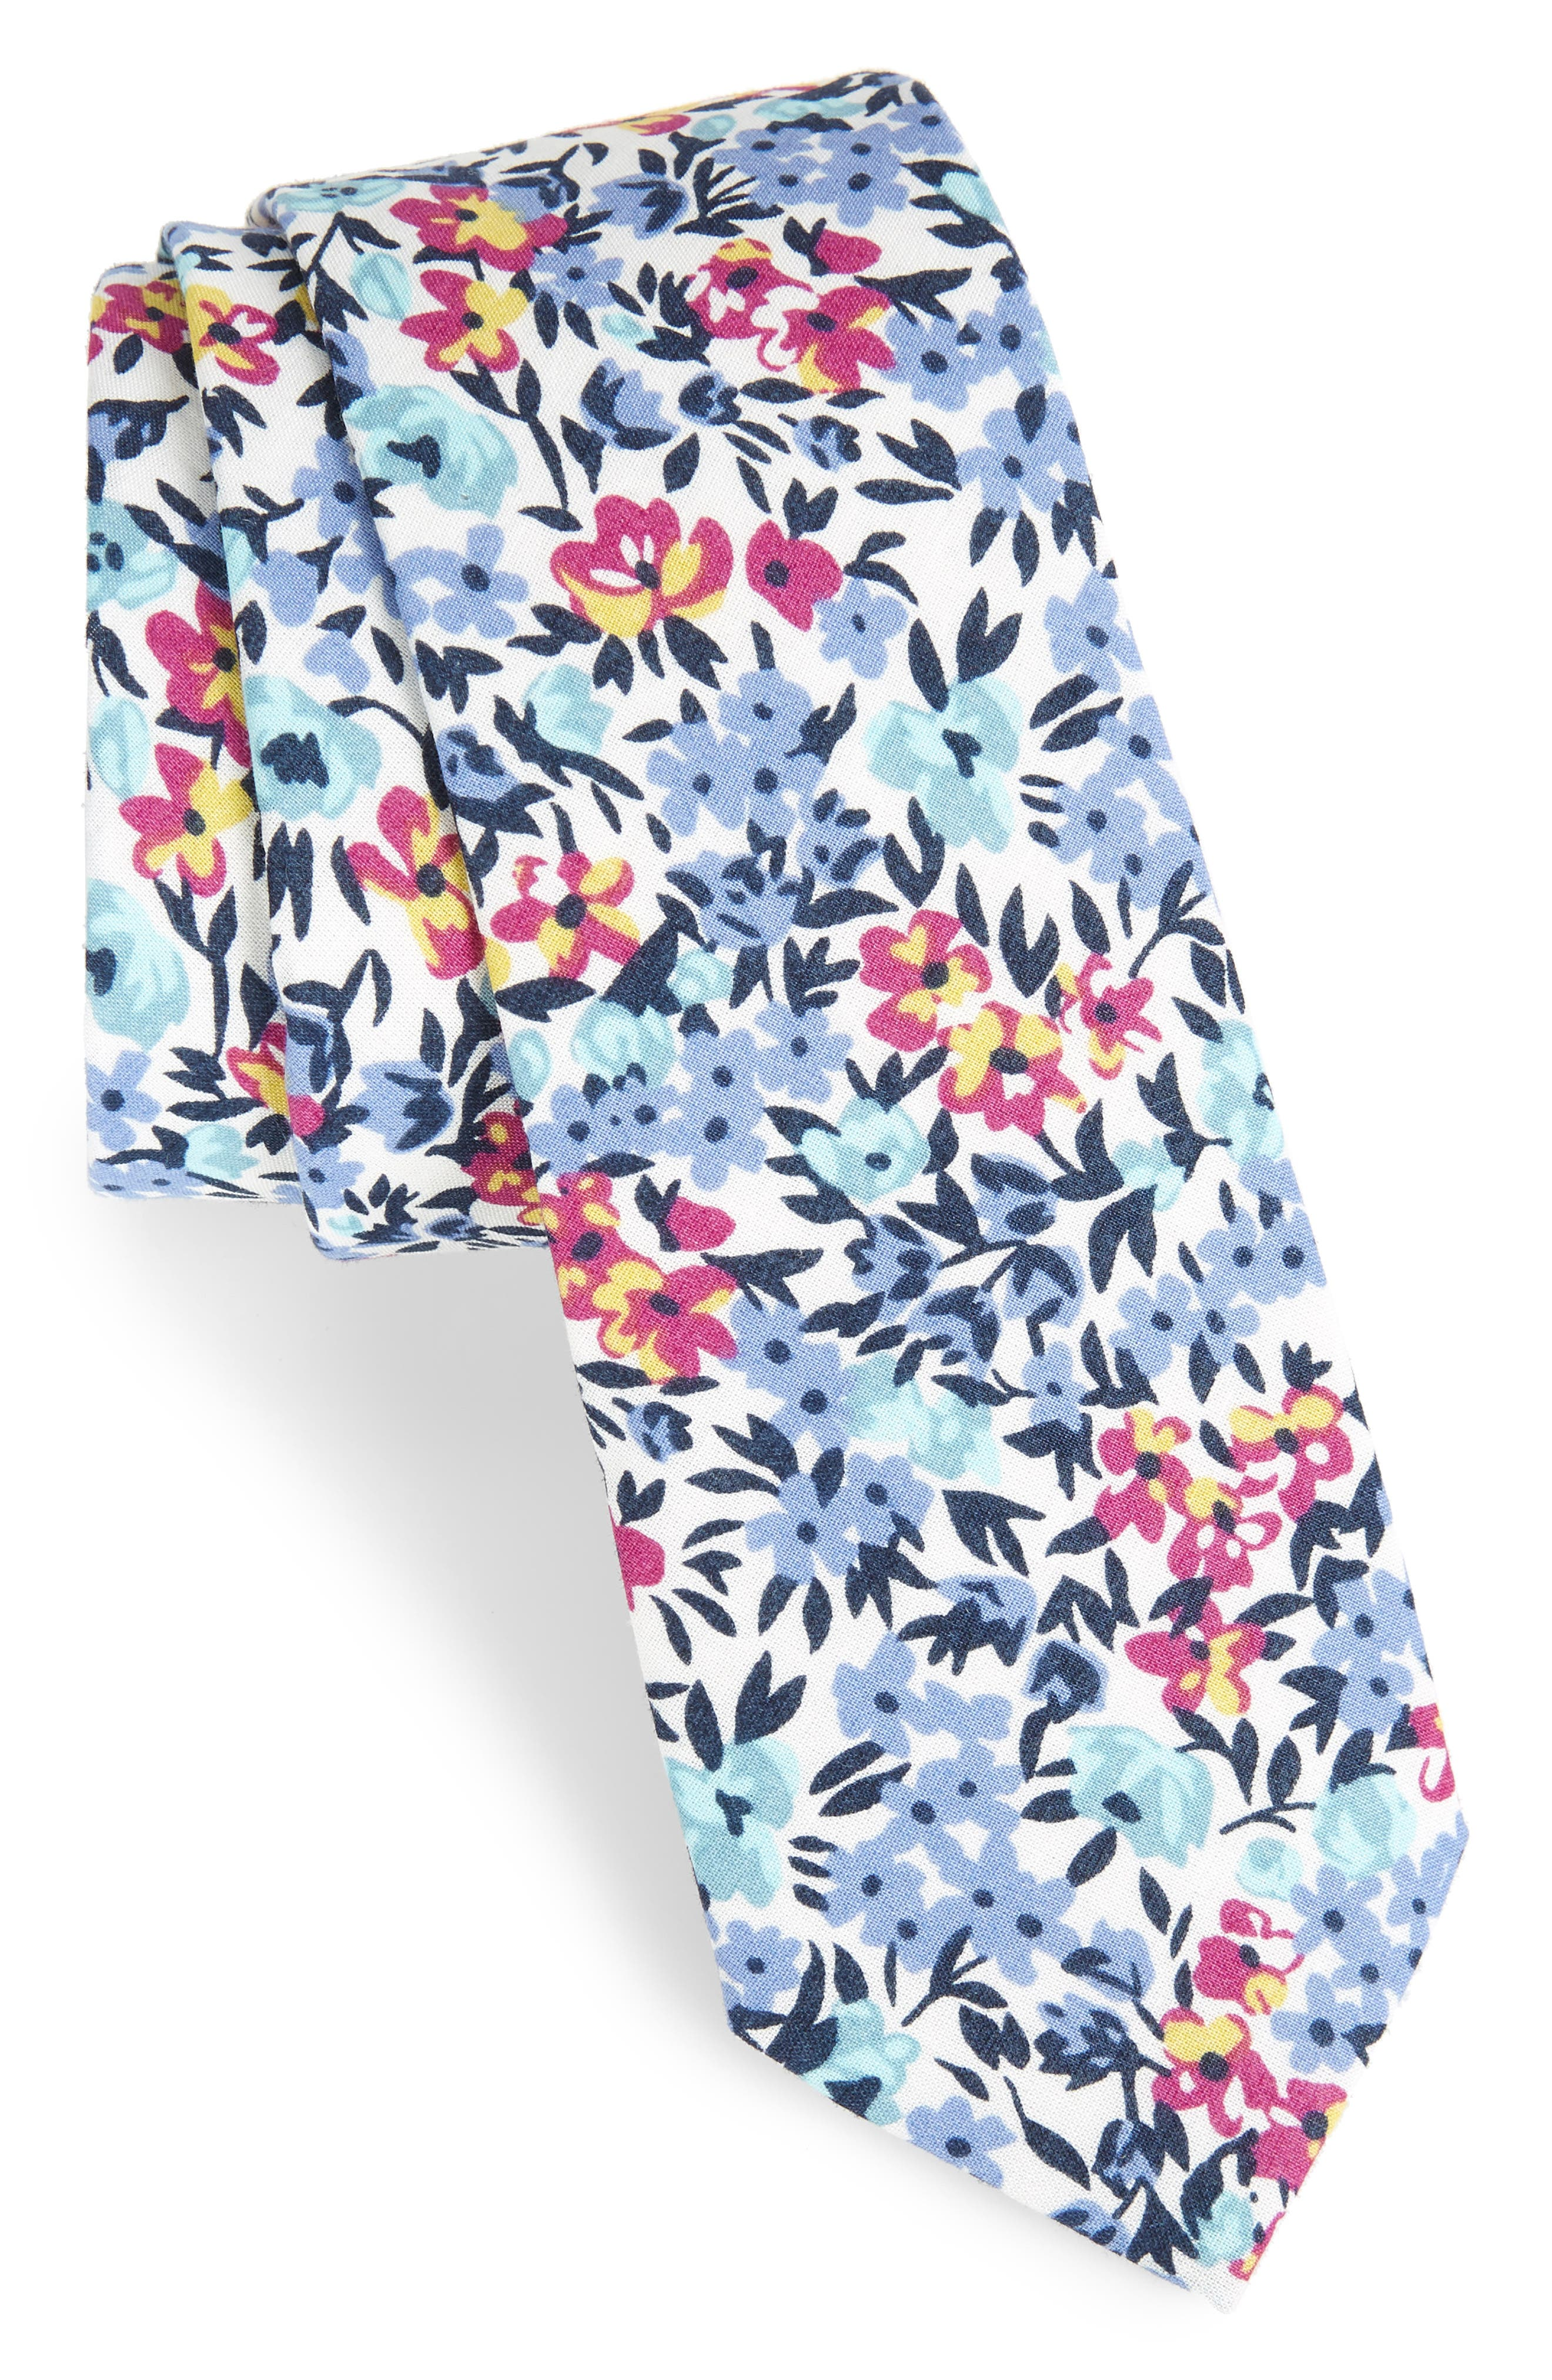 Anvil Floral Cotton Skinny Tie,                         Main,                         color, 400